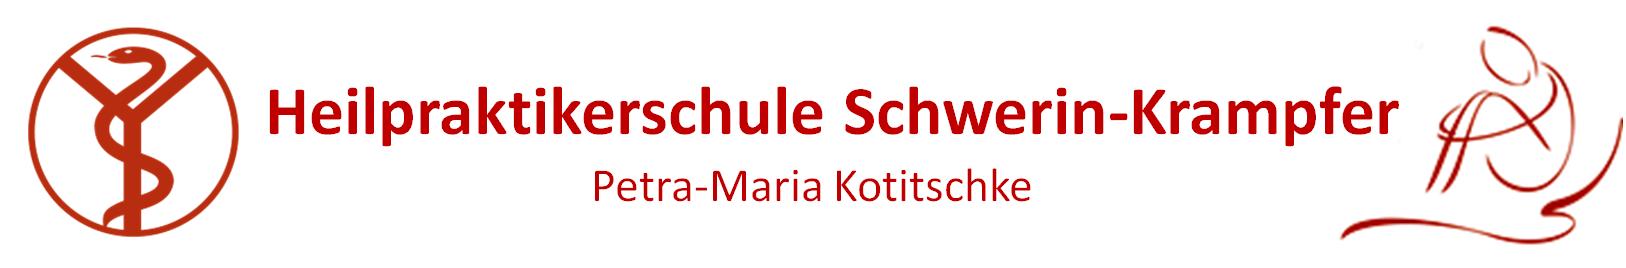 heilpraktikerschule-schwerin-krampfer.de